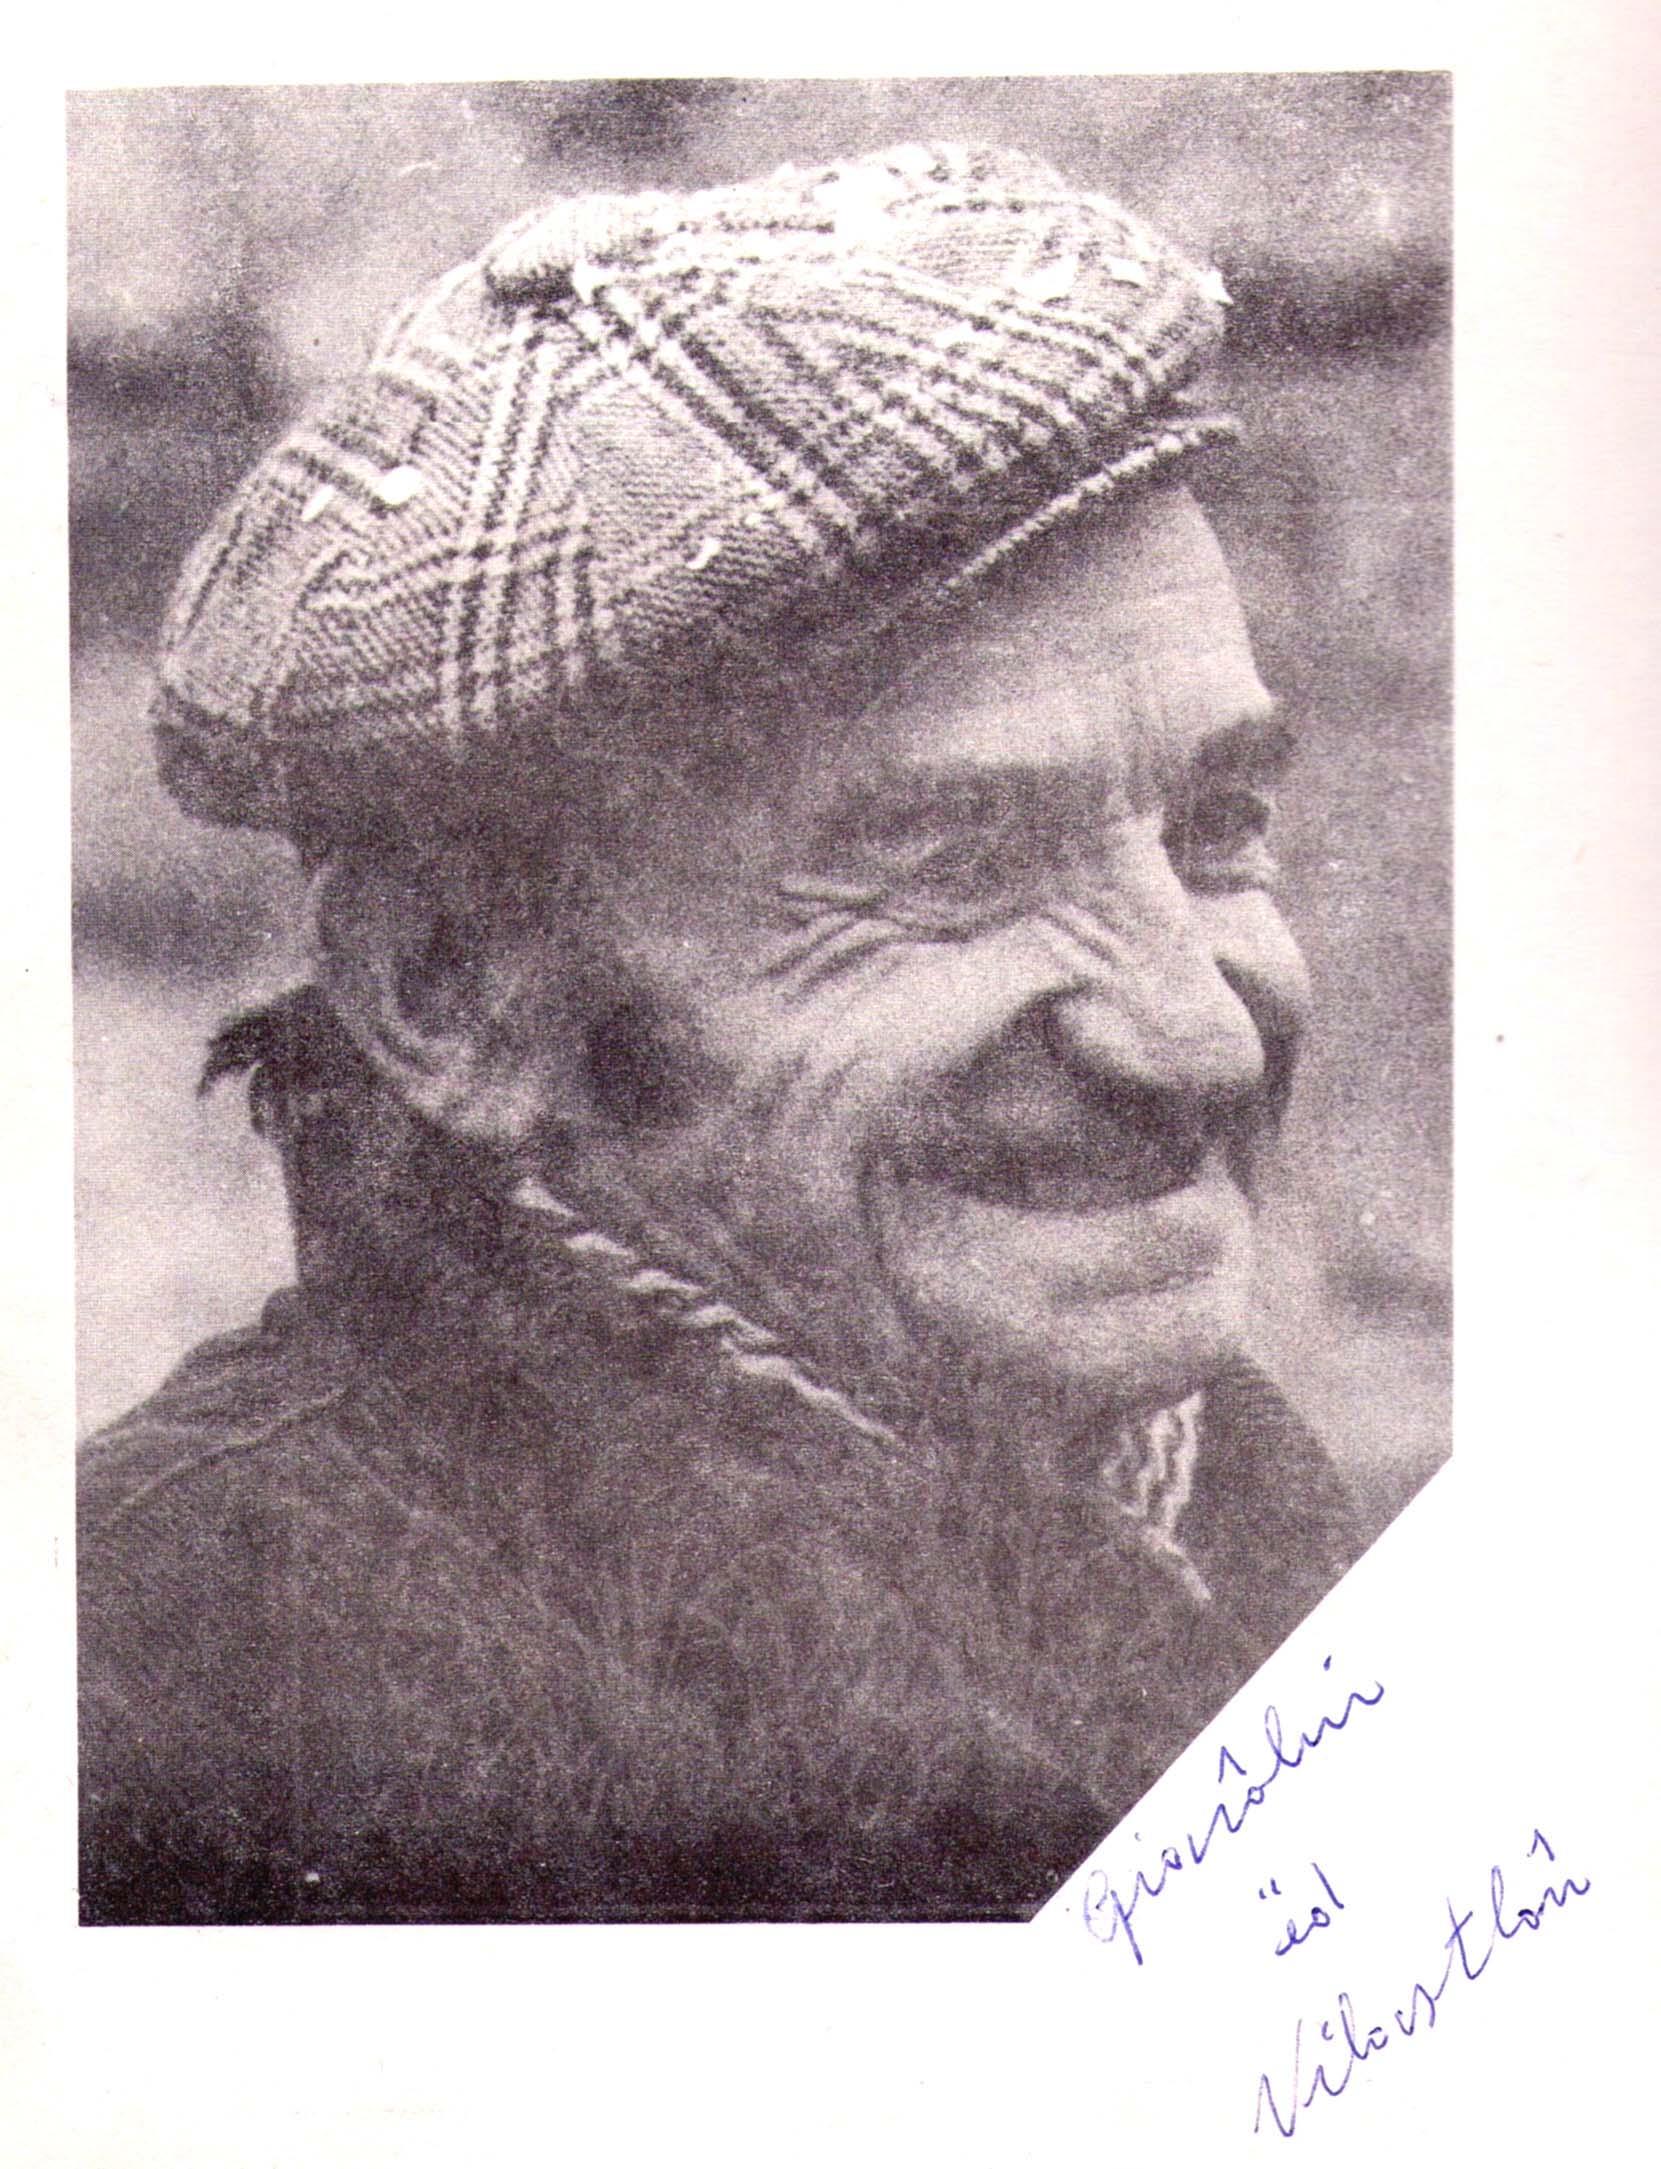 Giacomo Avataneo